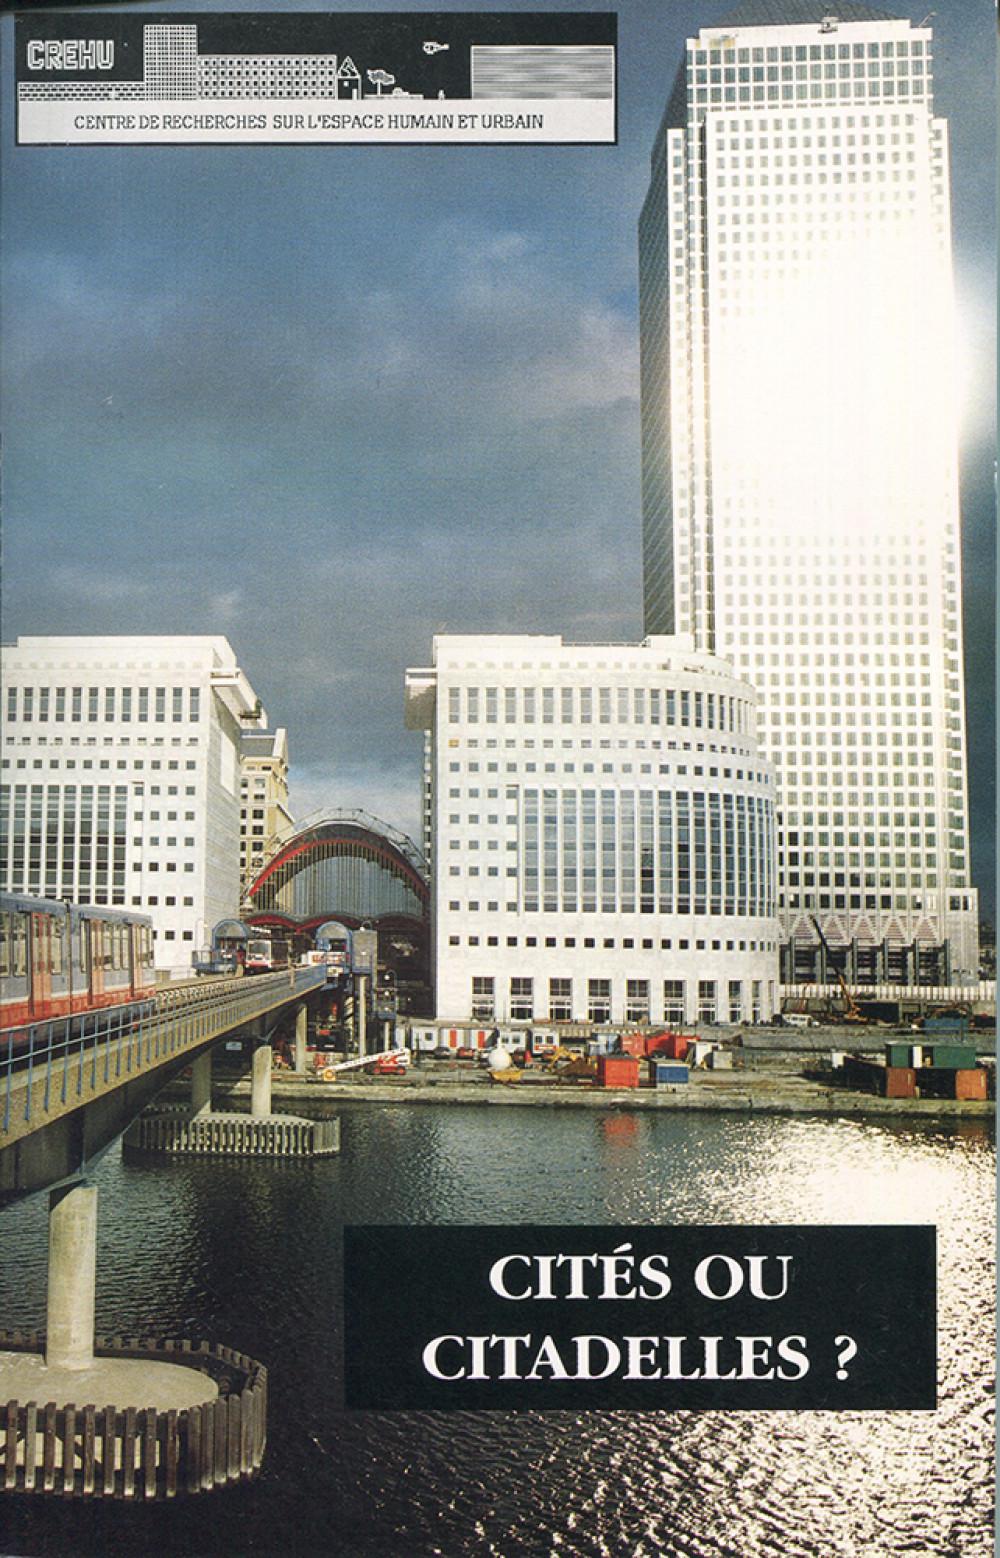 Cités ou citadelles ?